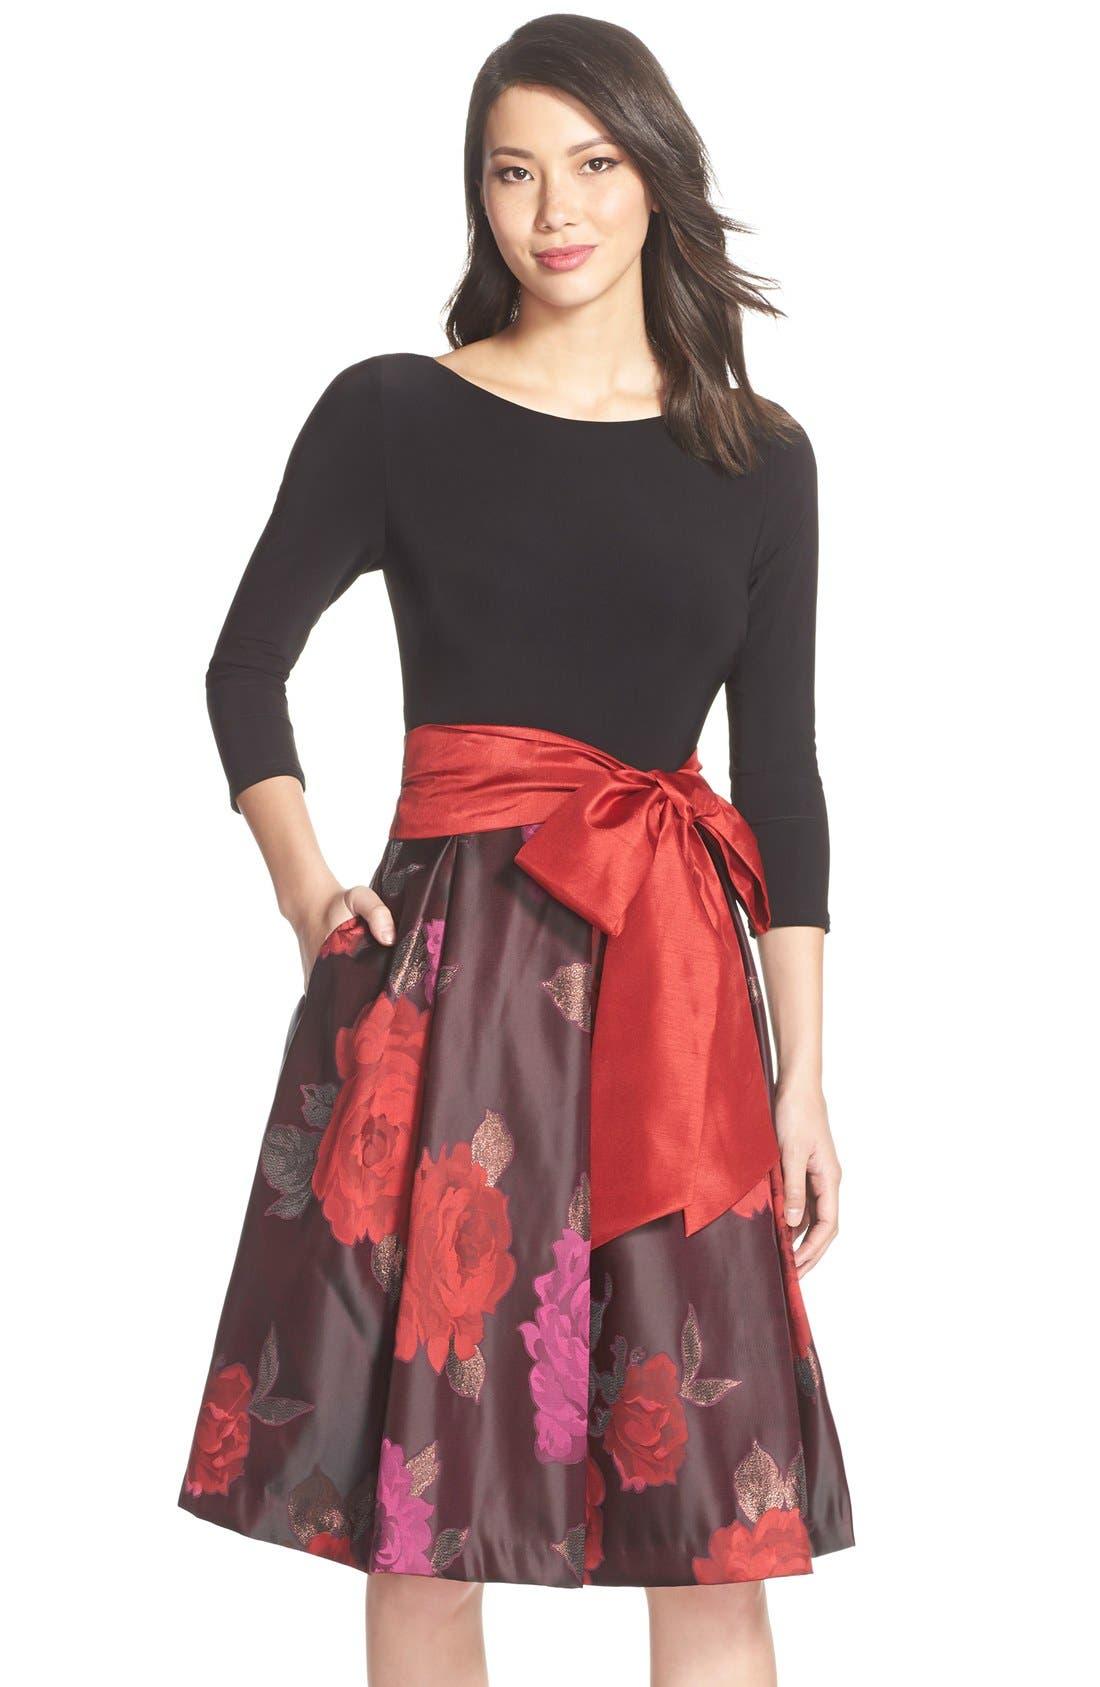 Floral Jacquard Fit & Flare Dress,                             Main thumbnail 1, color,                             014